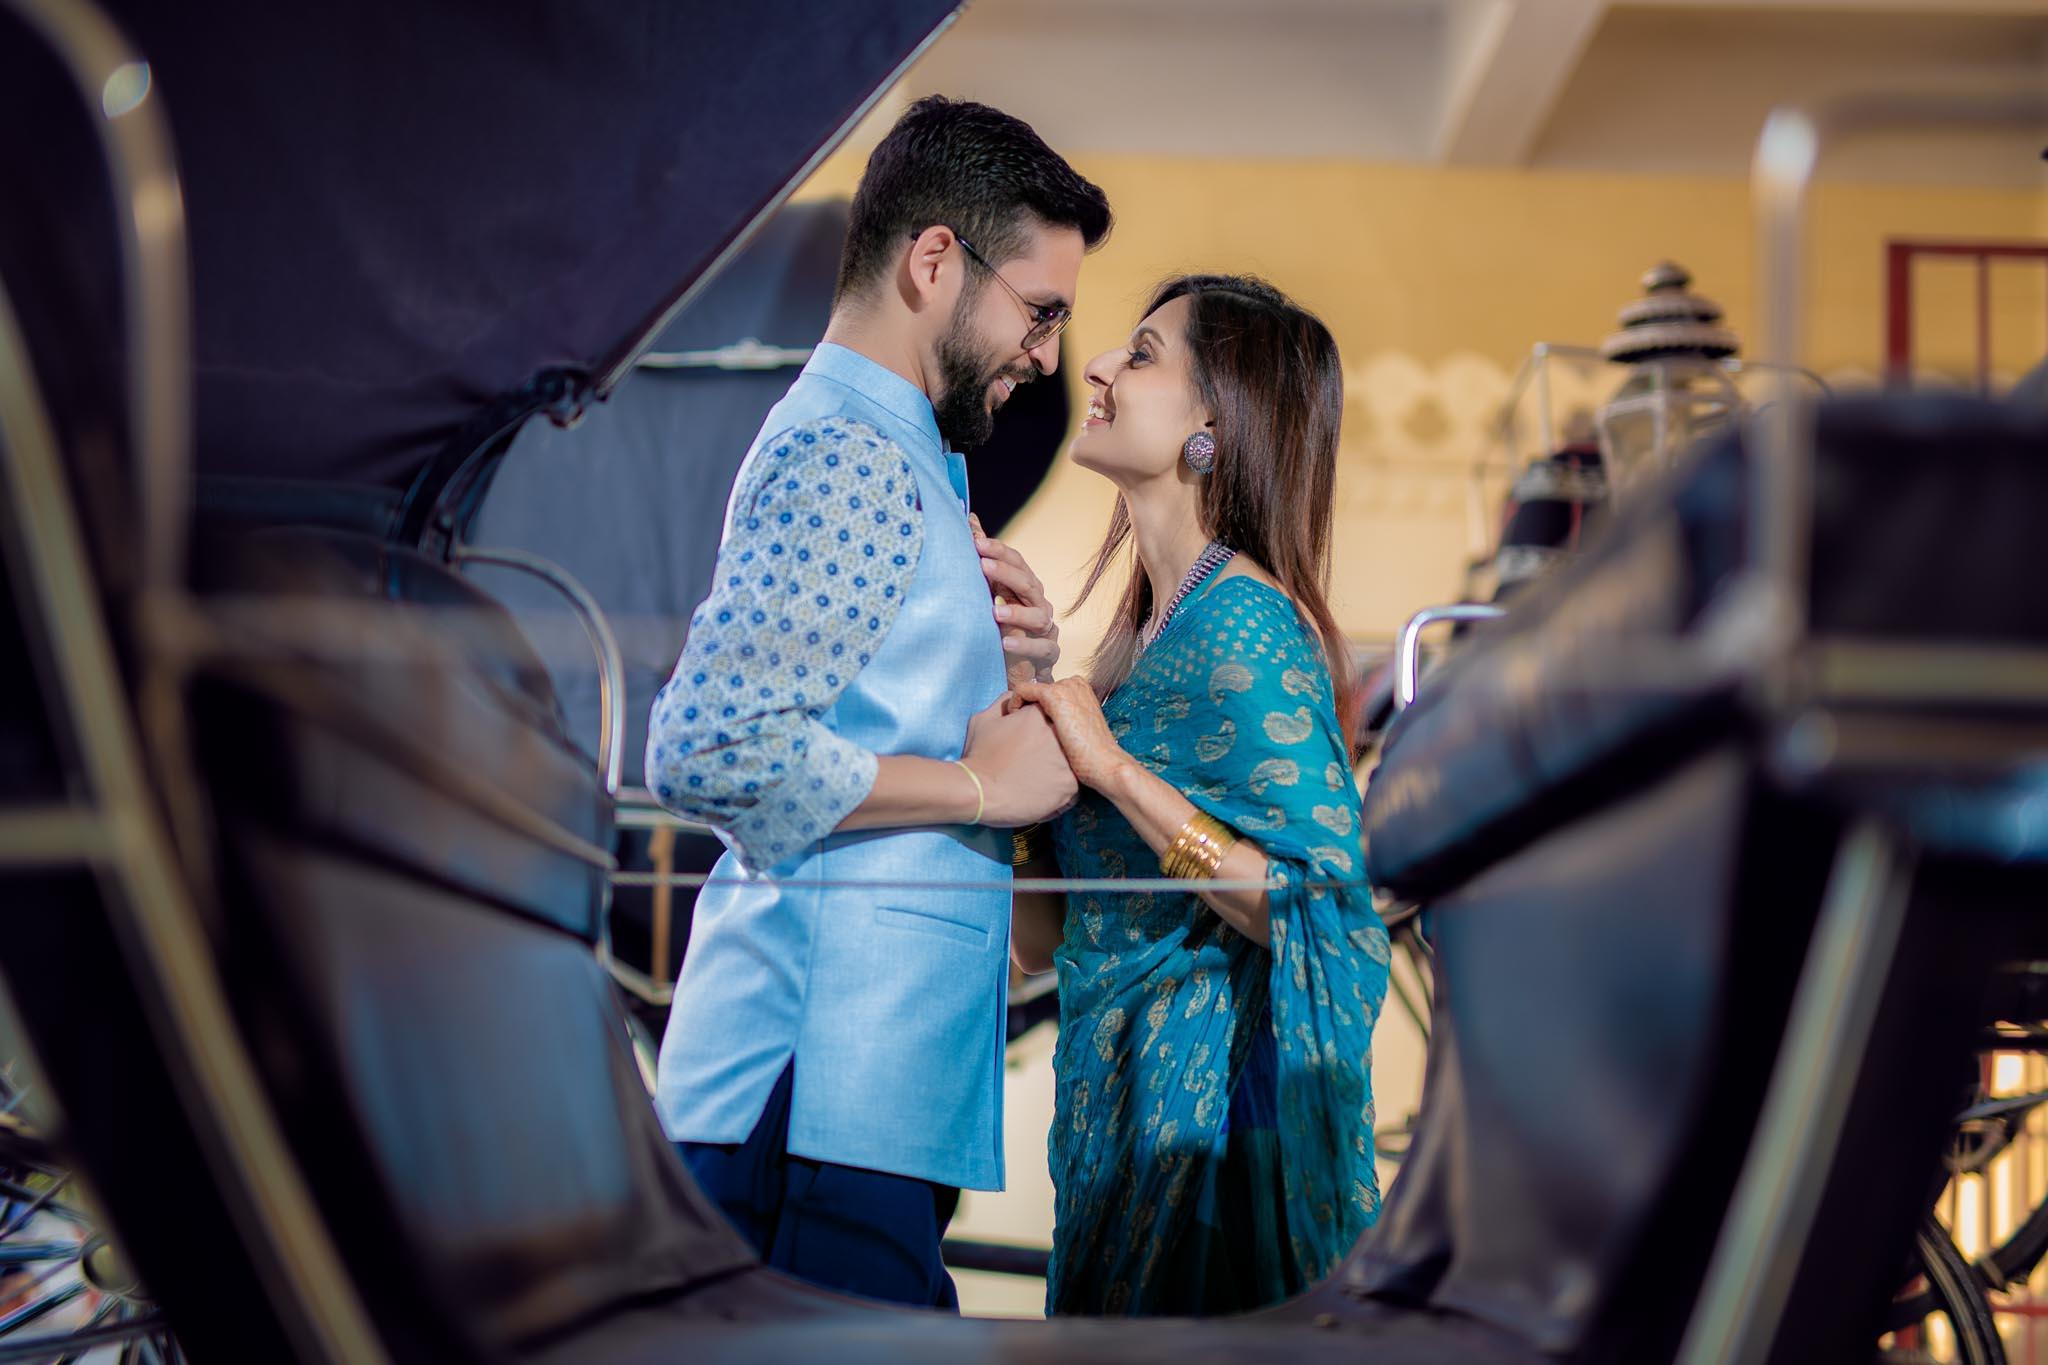 Best-of-2018-wedding-photography-focuz-studios-66